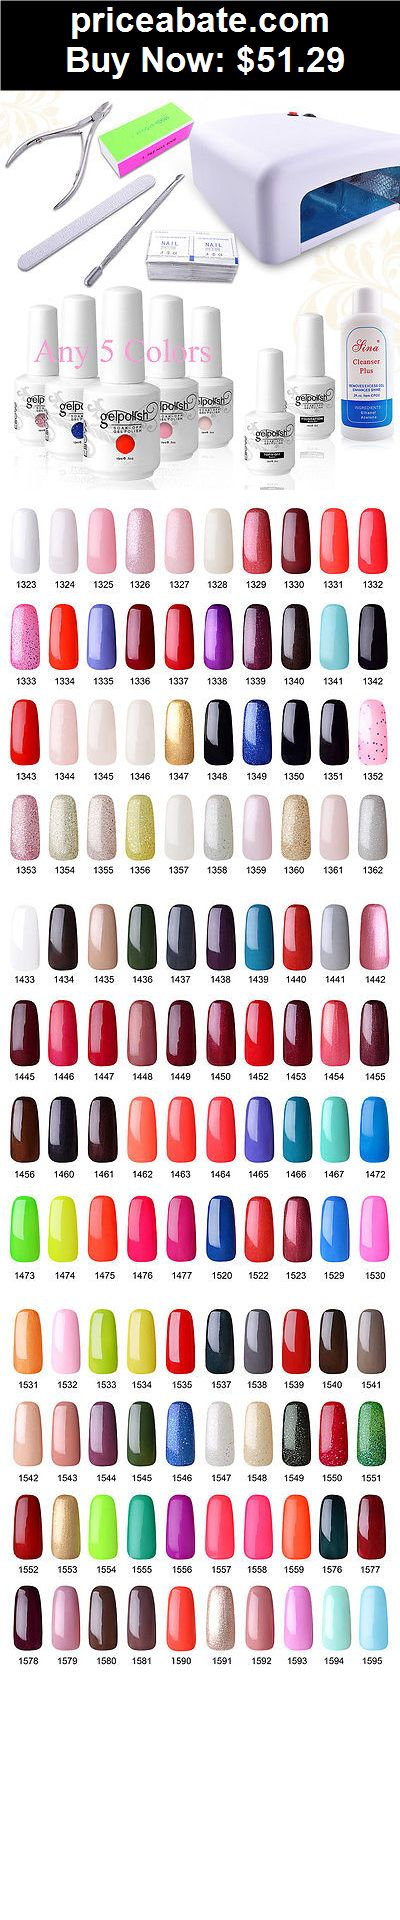 nails: Pick 5 Colours Soak Off Gel Nail Polish Top Base Coat 36W UV Lamp Manicure Kits - BUY IT NOW ONLY $51.29